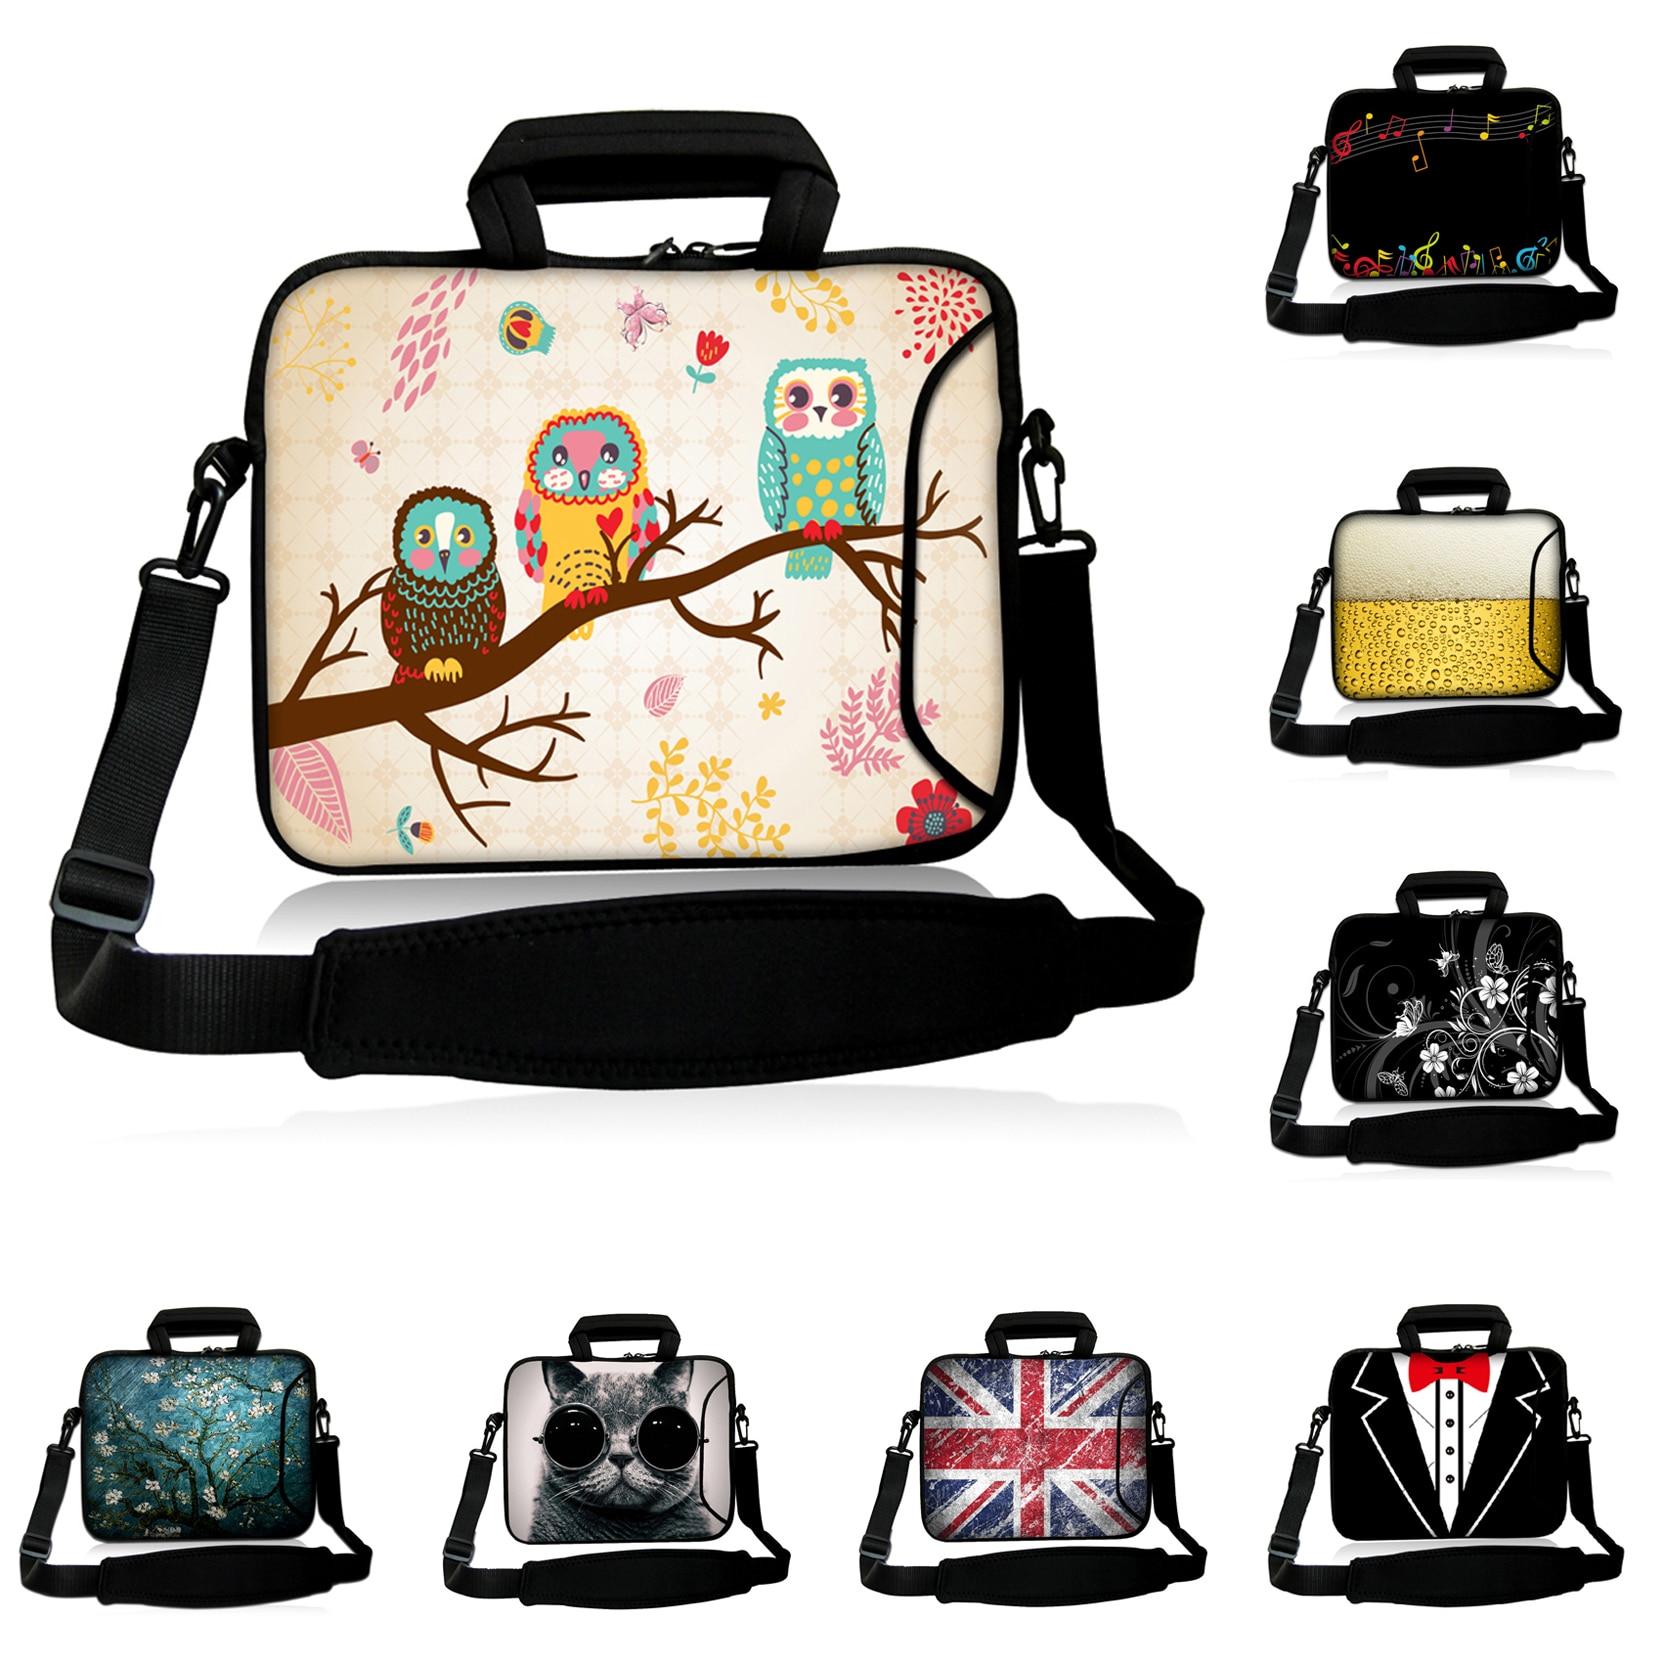 Girls Messenger E-book Computer Laptop Bags 10.1 9.7 12.8 12.2 11.6 17 15 14 13.3 inch Shoulder Strap Notebook Cases For Xiaomi<br><br>Aliexpress